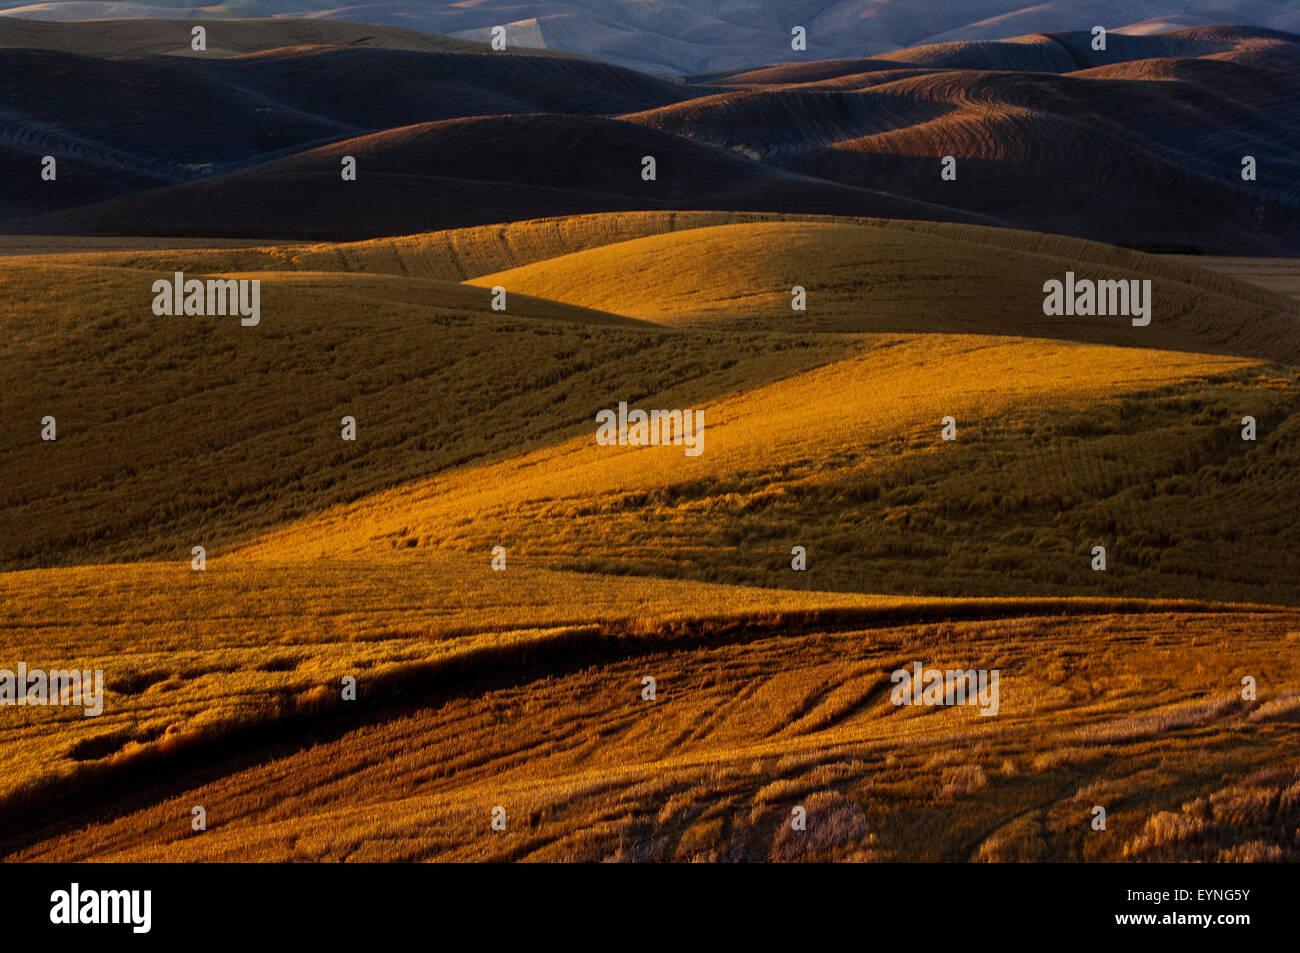 Grain fields at sunset in the Paloue region of Washington Stock Photo